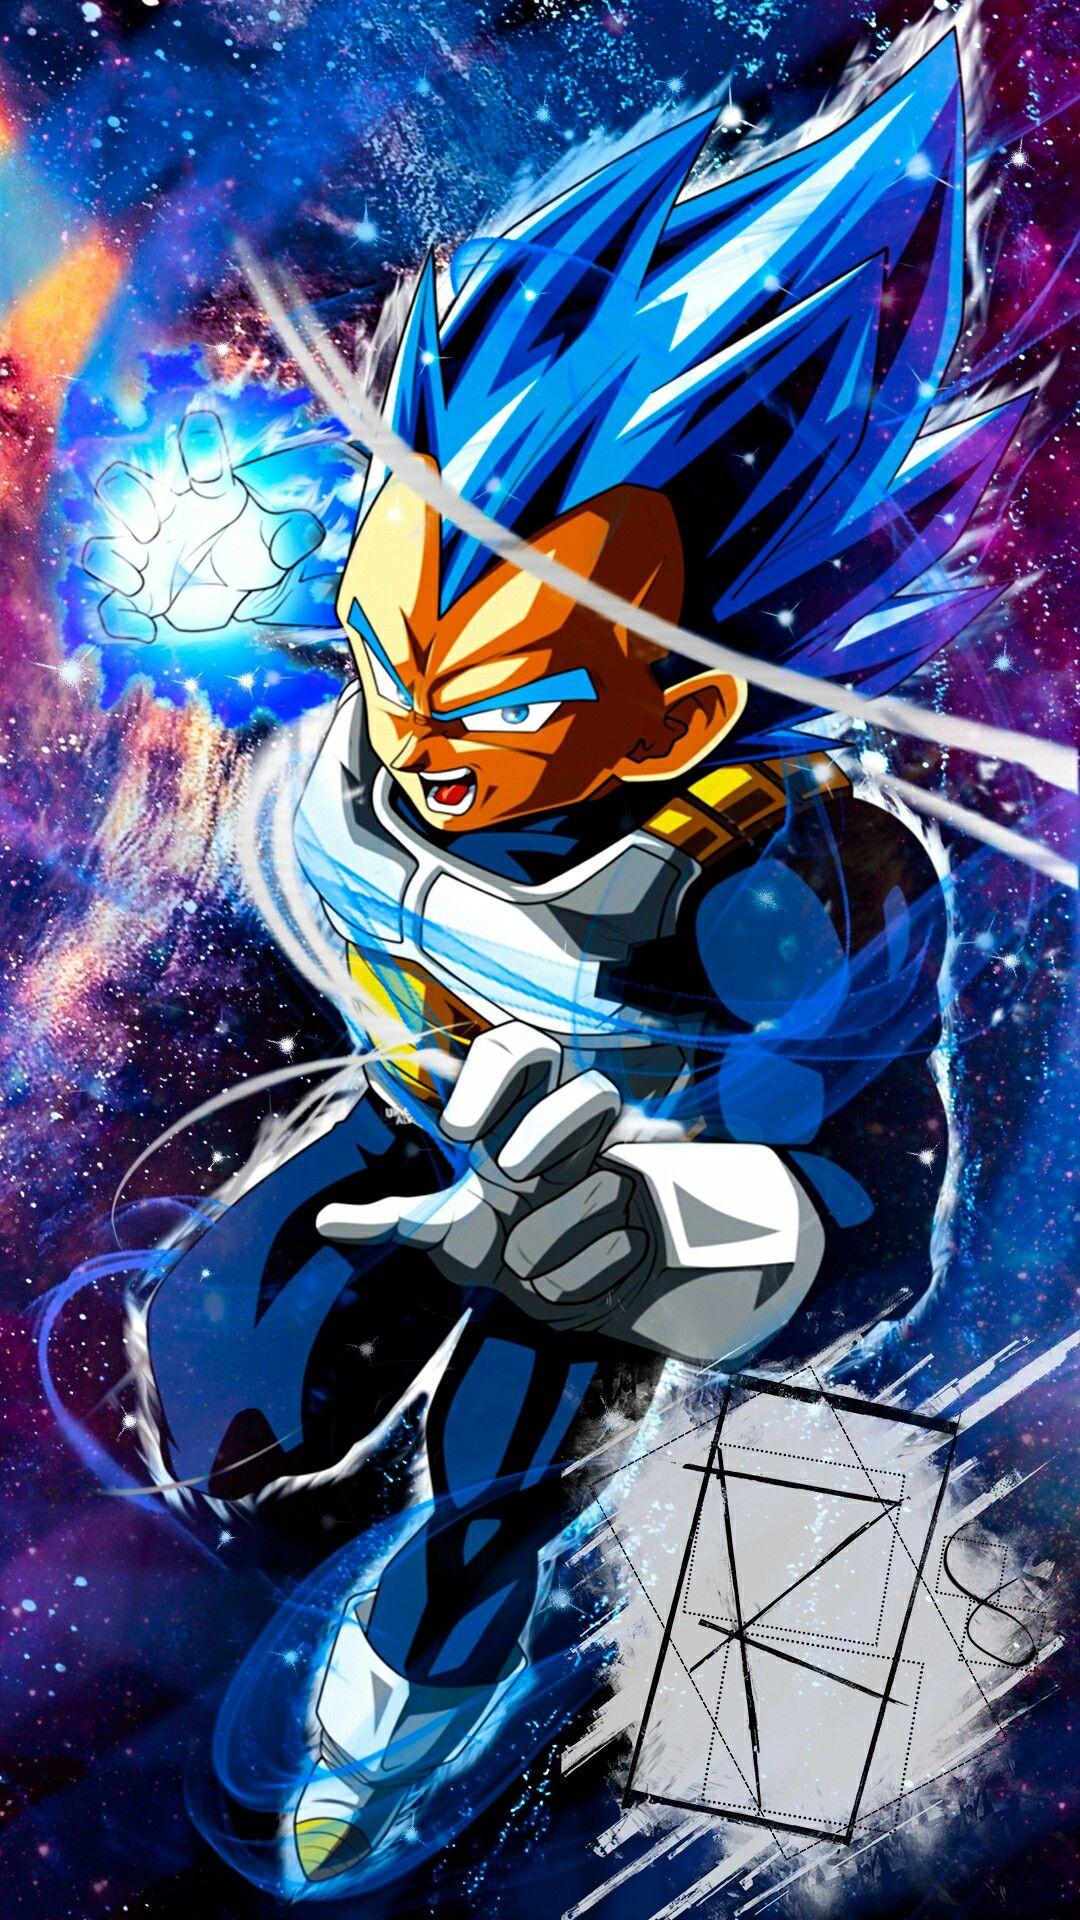 Vegeta Ssj Blue Full Power Universo 7 Pantalla De Goku